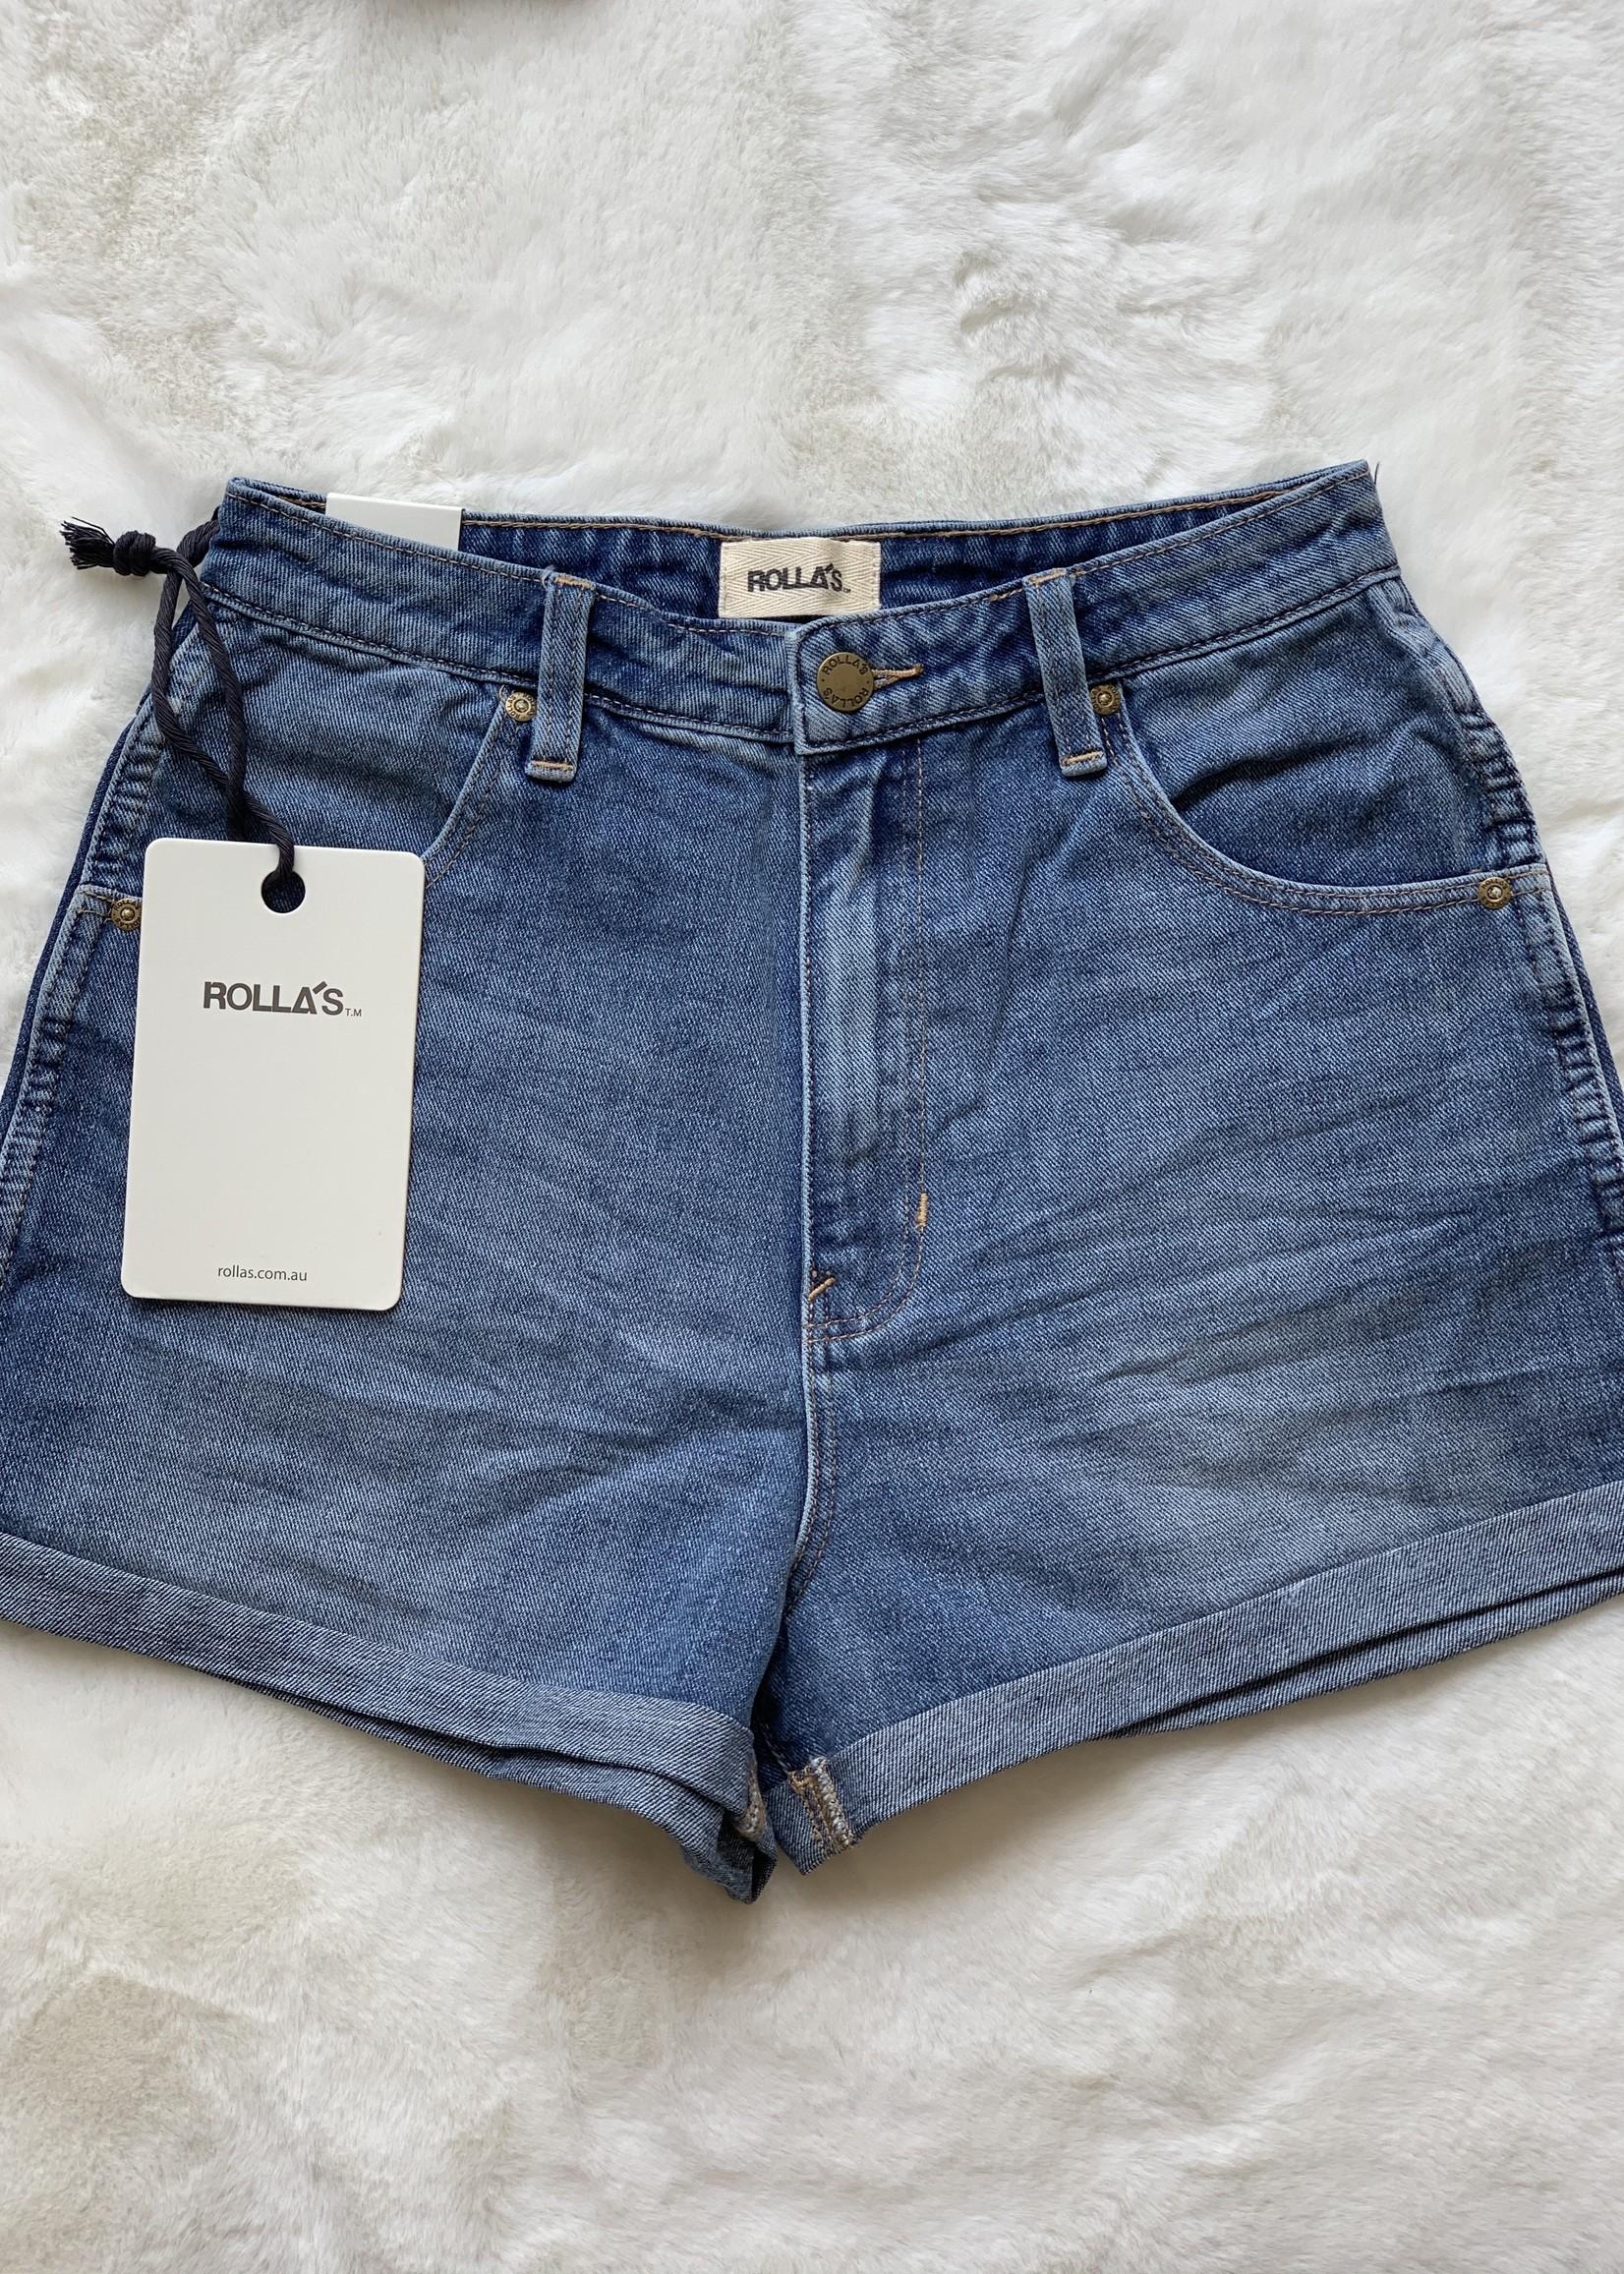 rollas rollas dusters shorts